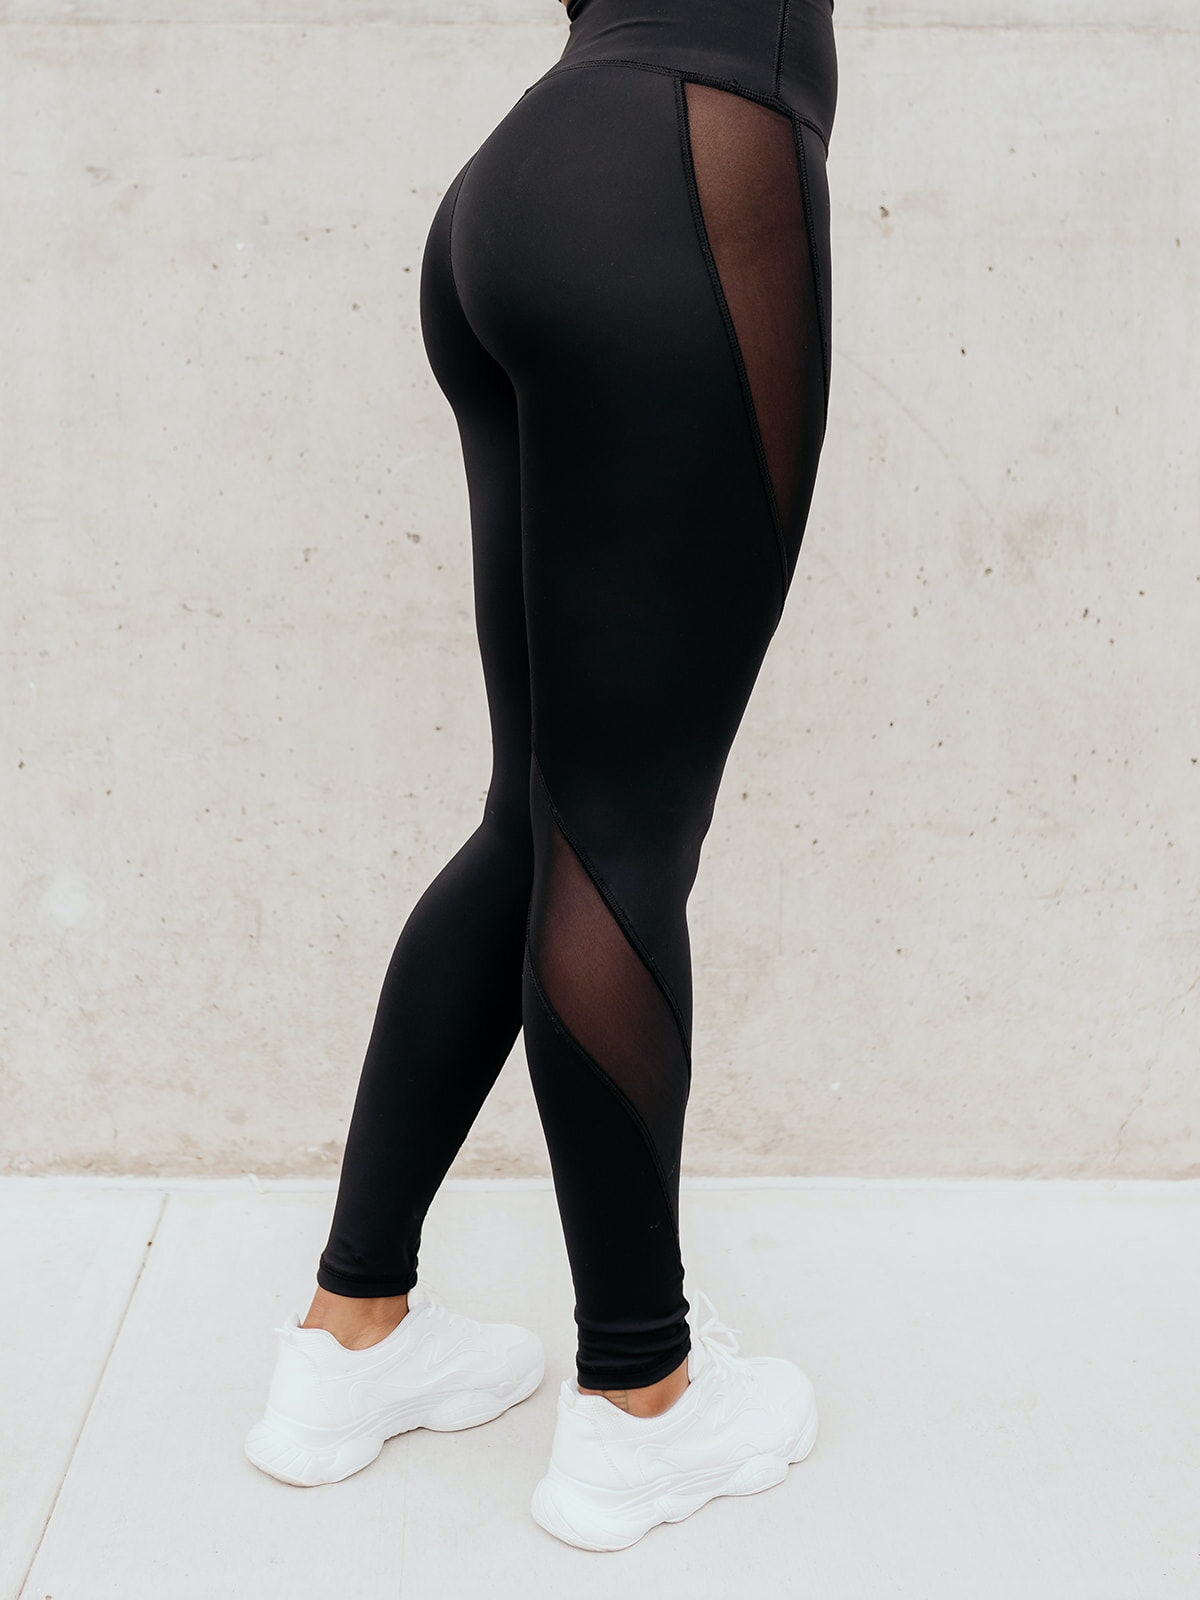 Solely Fit Aminatu Mesh Leg